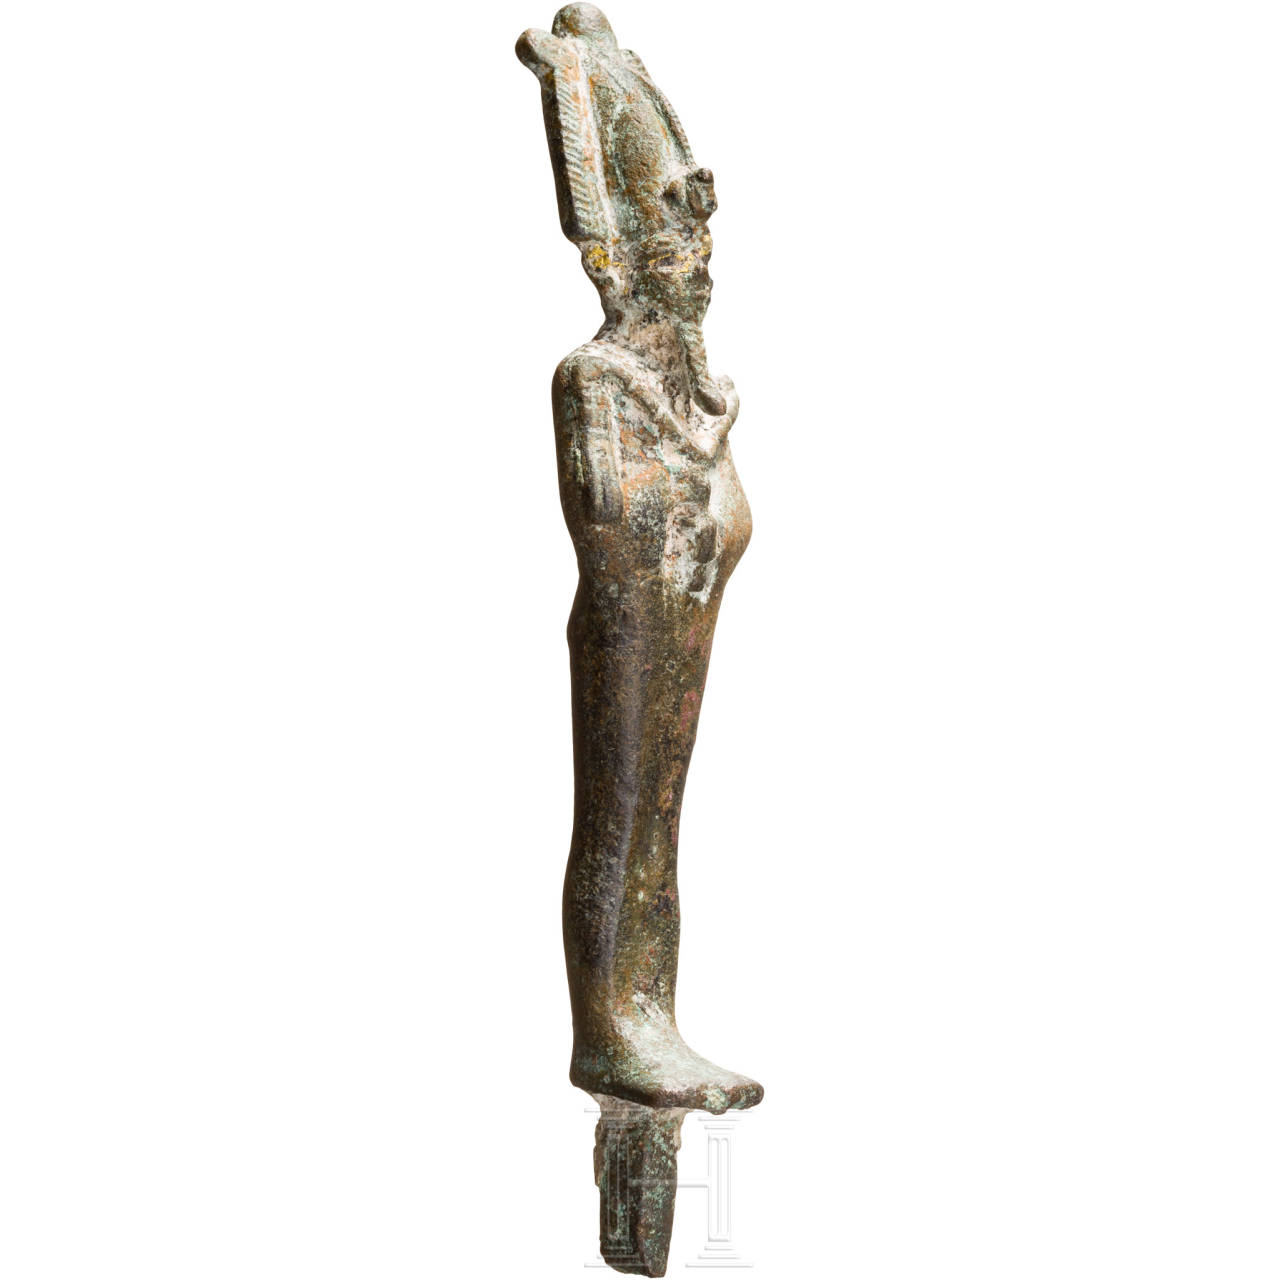 Osiris-Miniaturstele, Ägypten, 2. - 1. Jtsd. v. Chr.